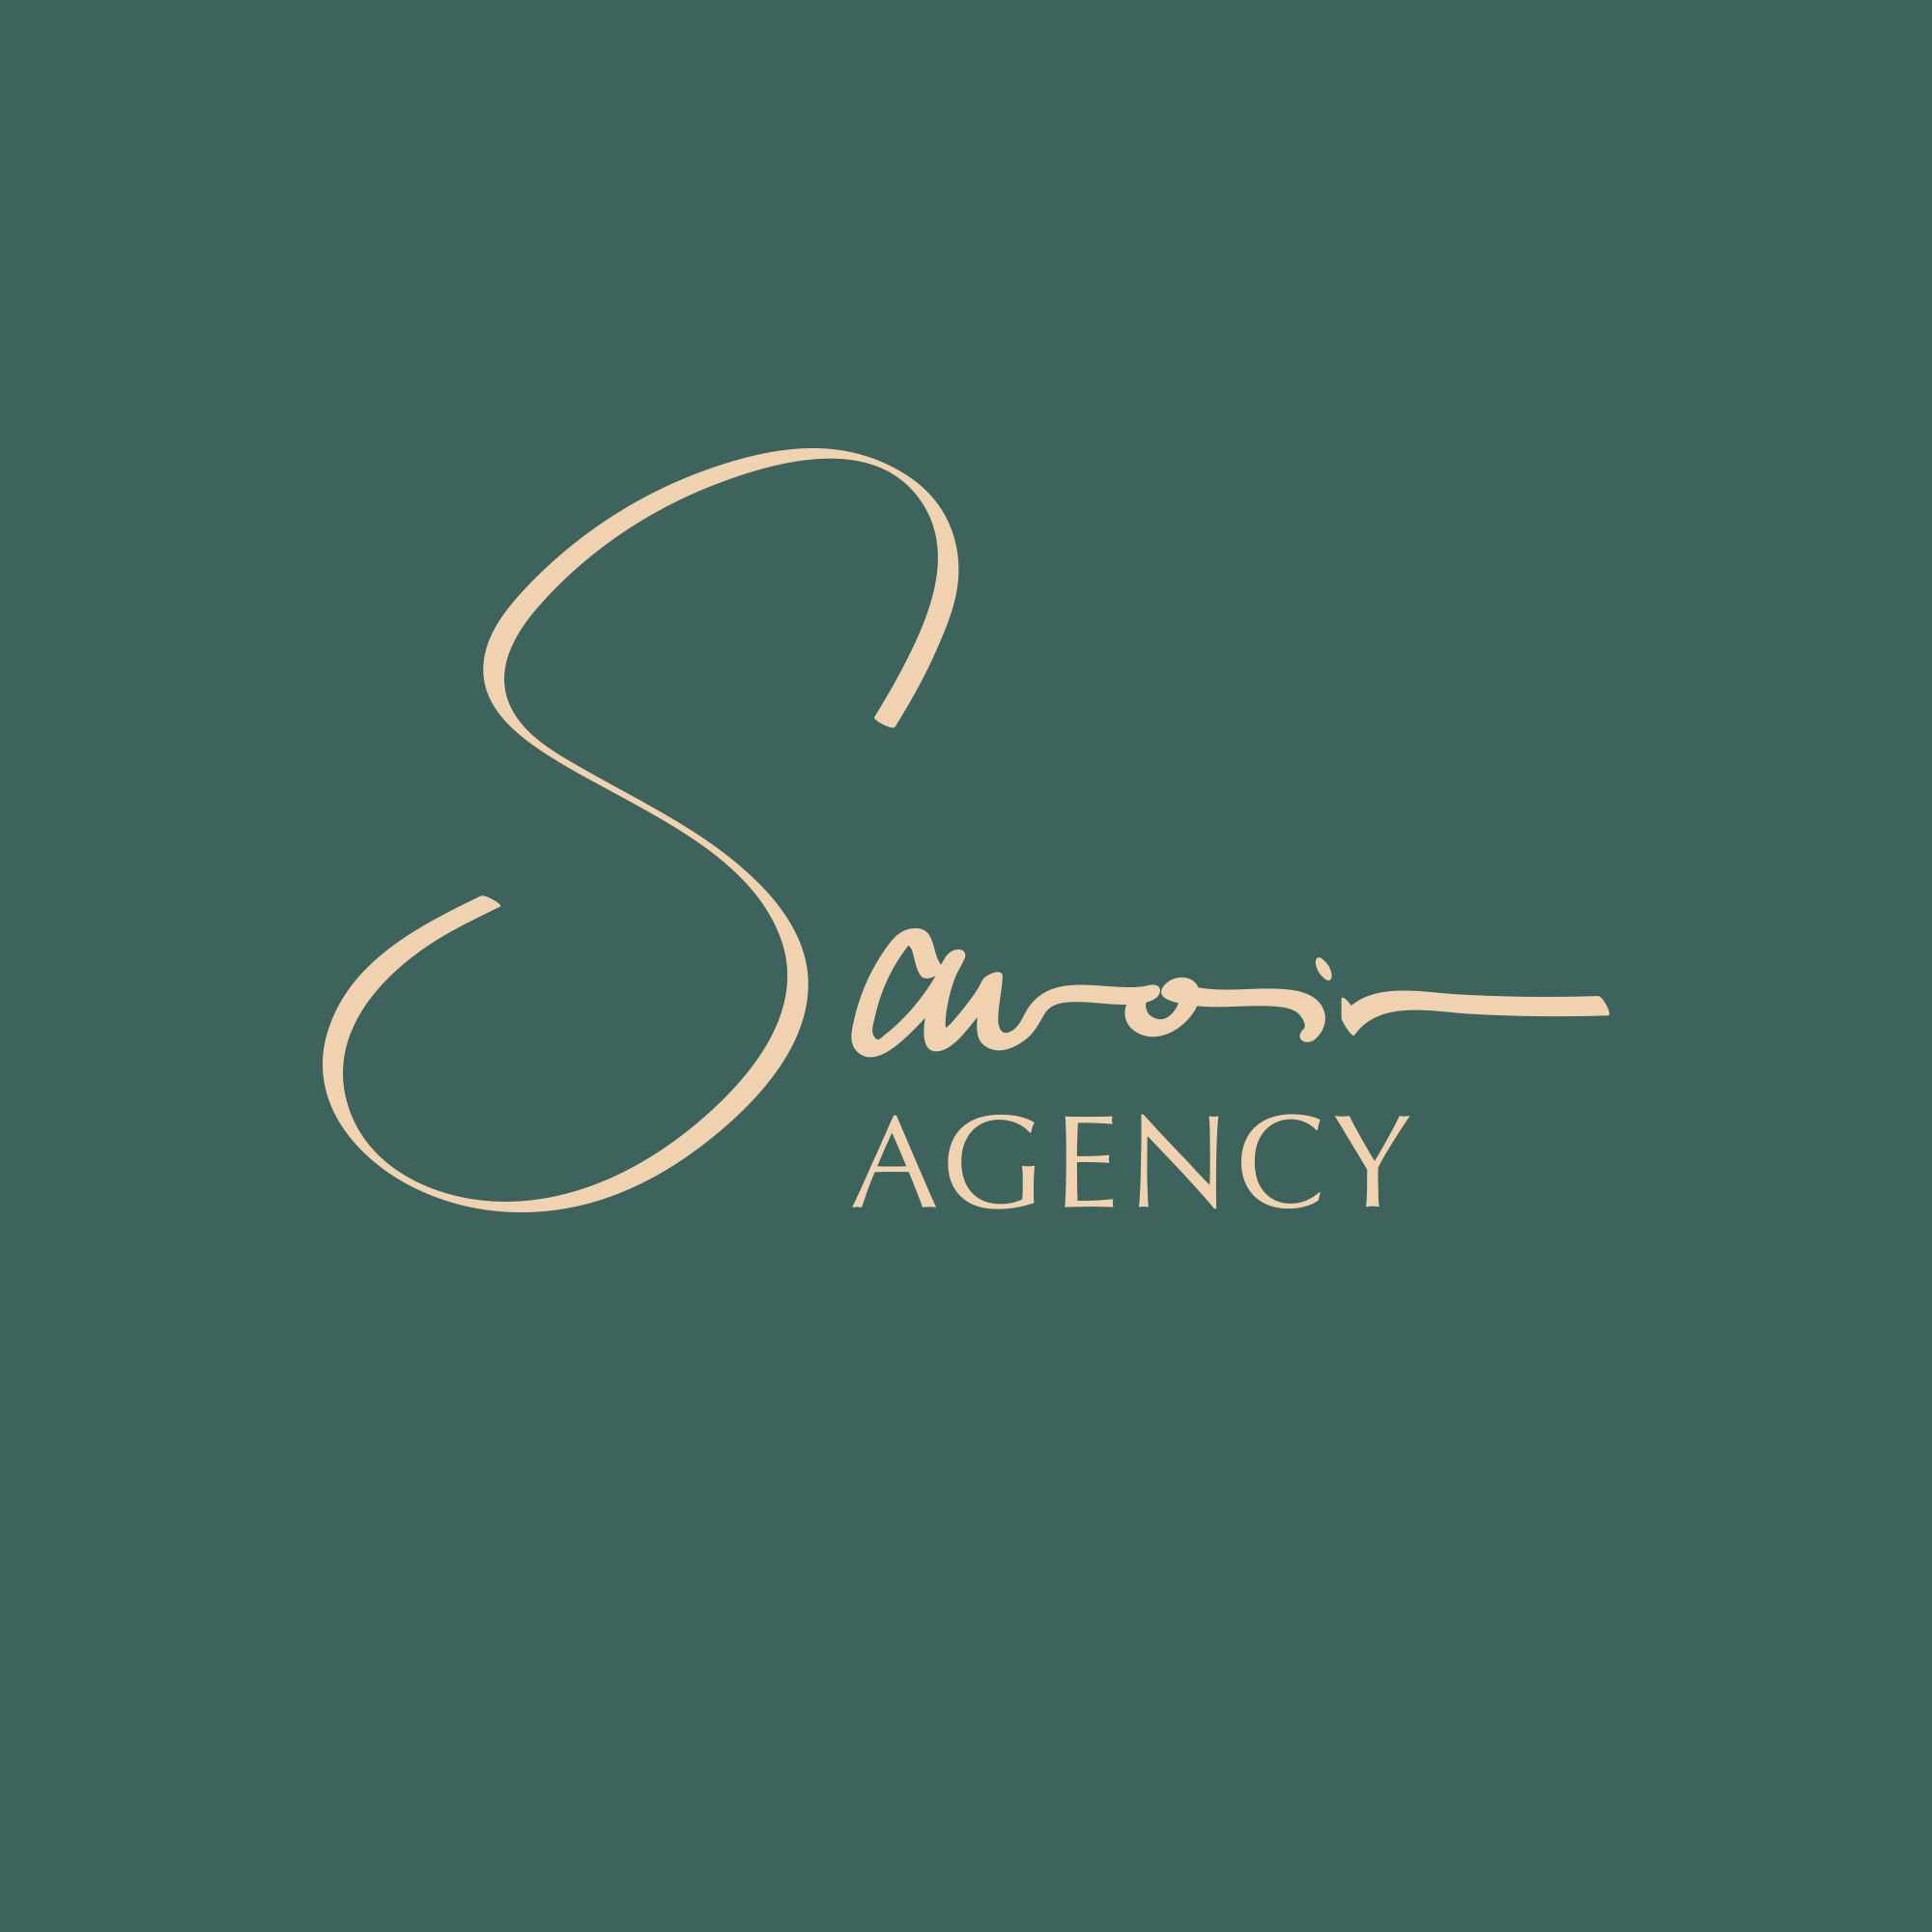 SavoirAgency_logo_design.jpg